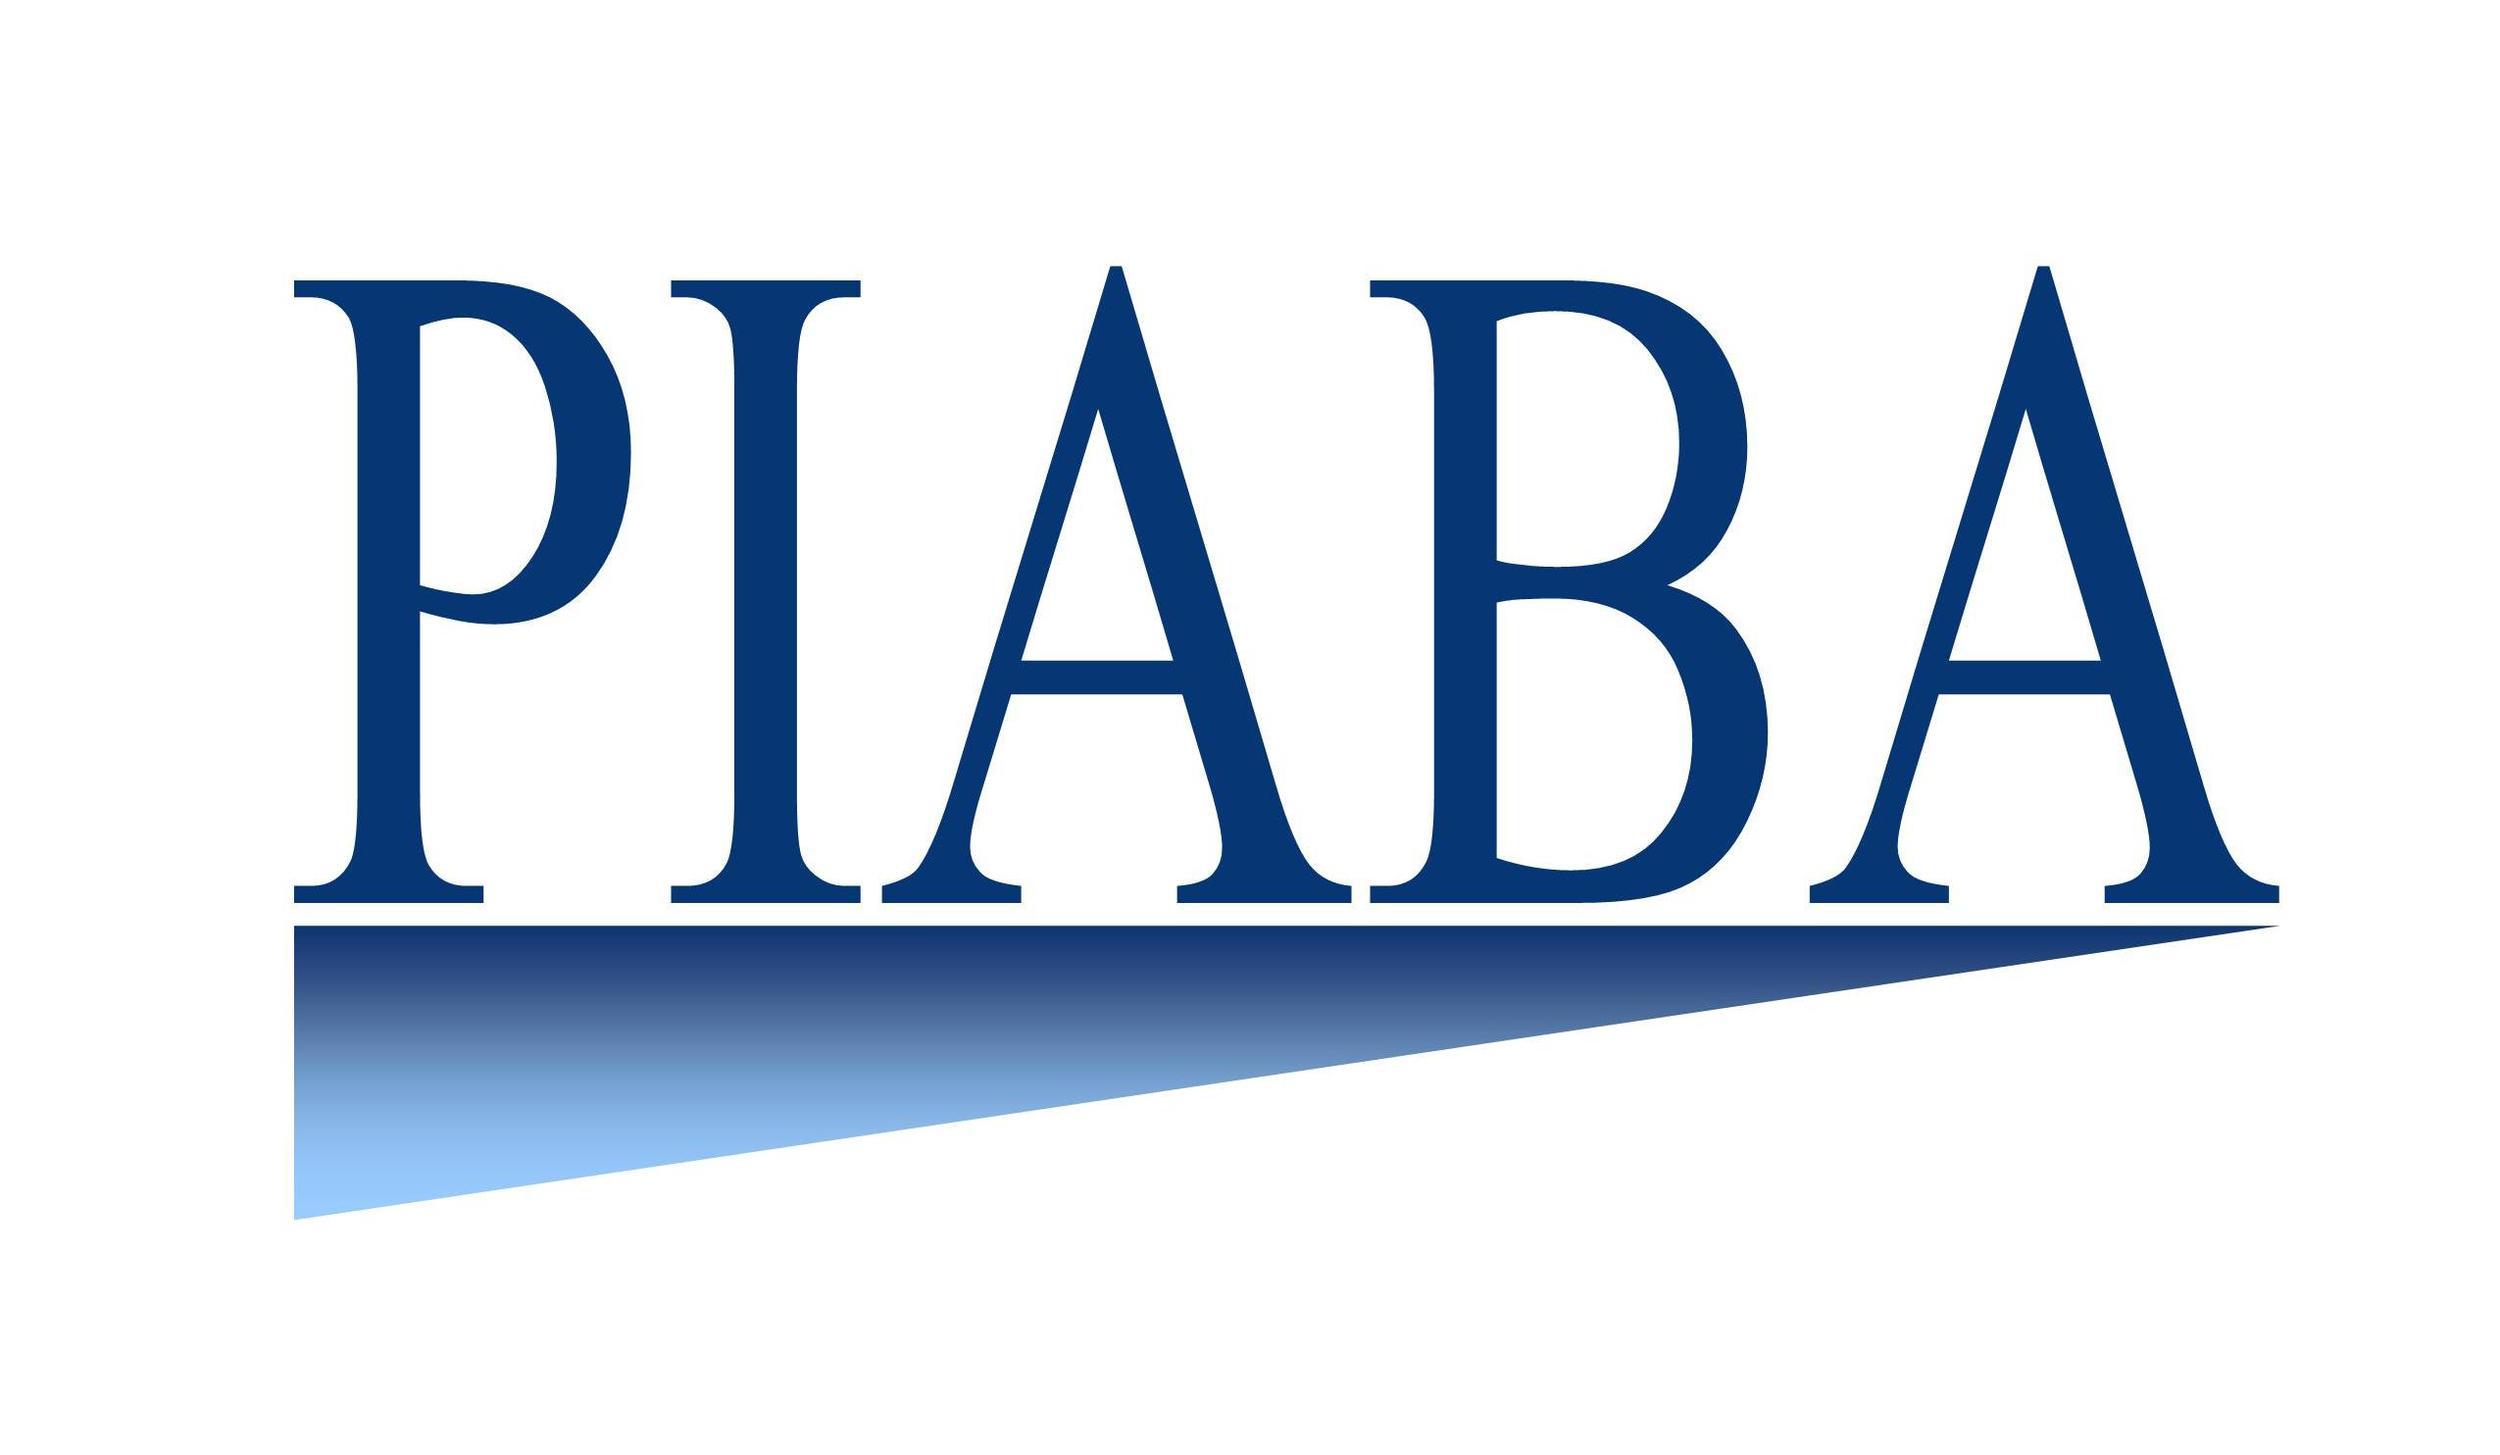 Public investors arbitration bar association credentials for jon furgison